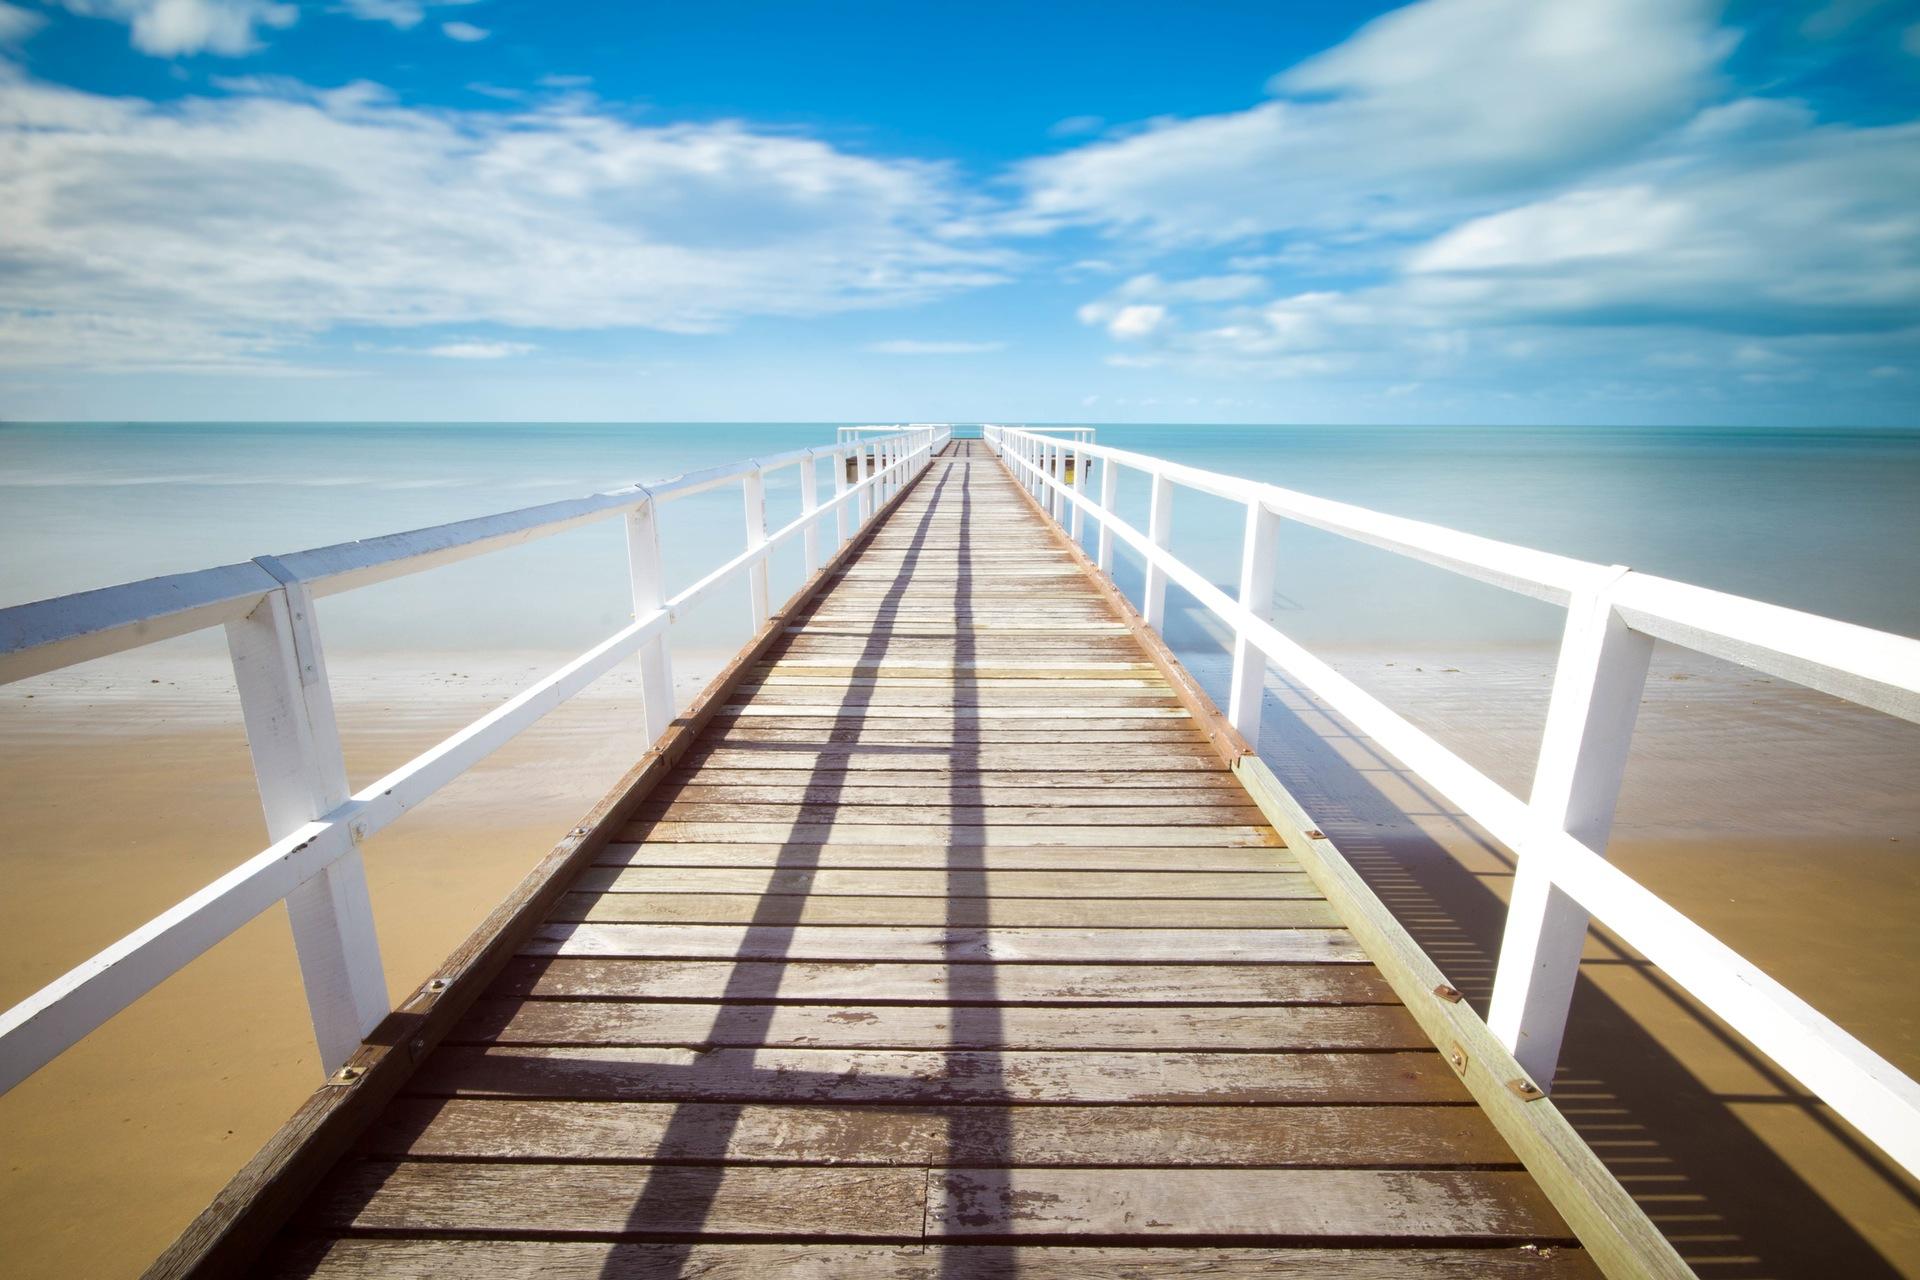 embarcadero, playa, verano, relax, cielo, mar, agua, azul - Fondos de Pantalla HD - professor-falken.com